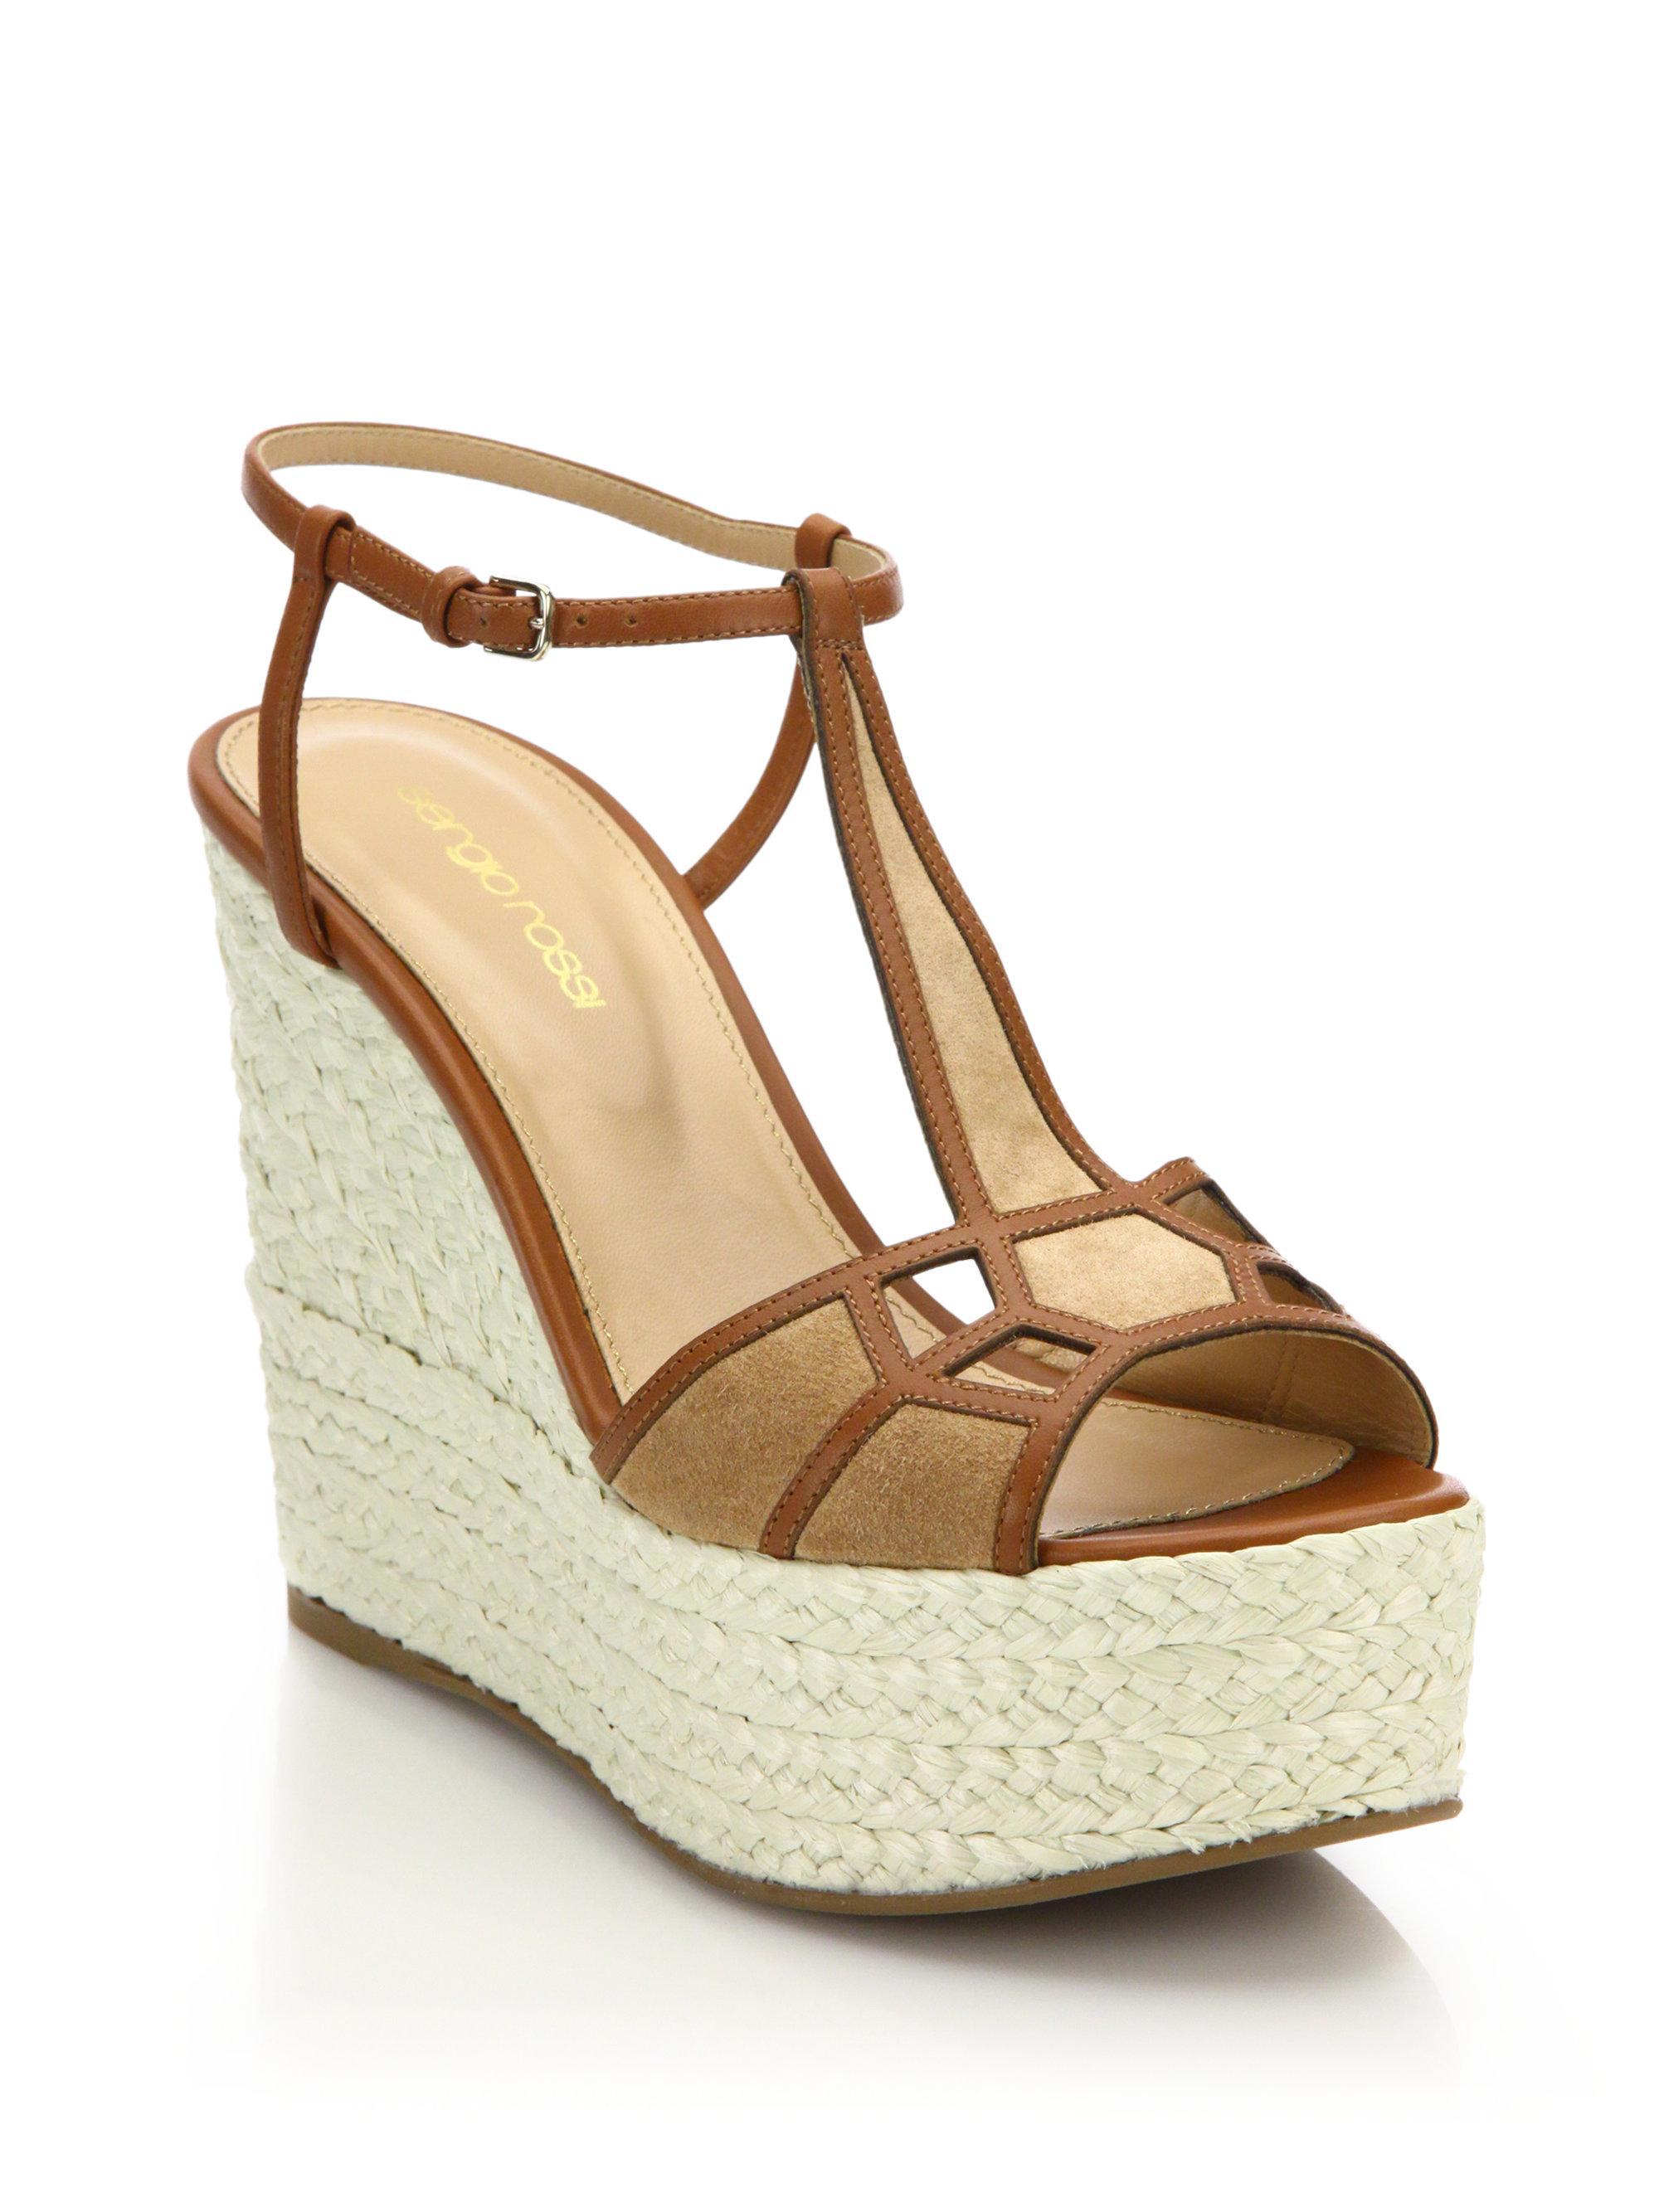 Sergio Rossi Platform sandals smooth leather suede white Zlql3h6